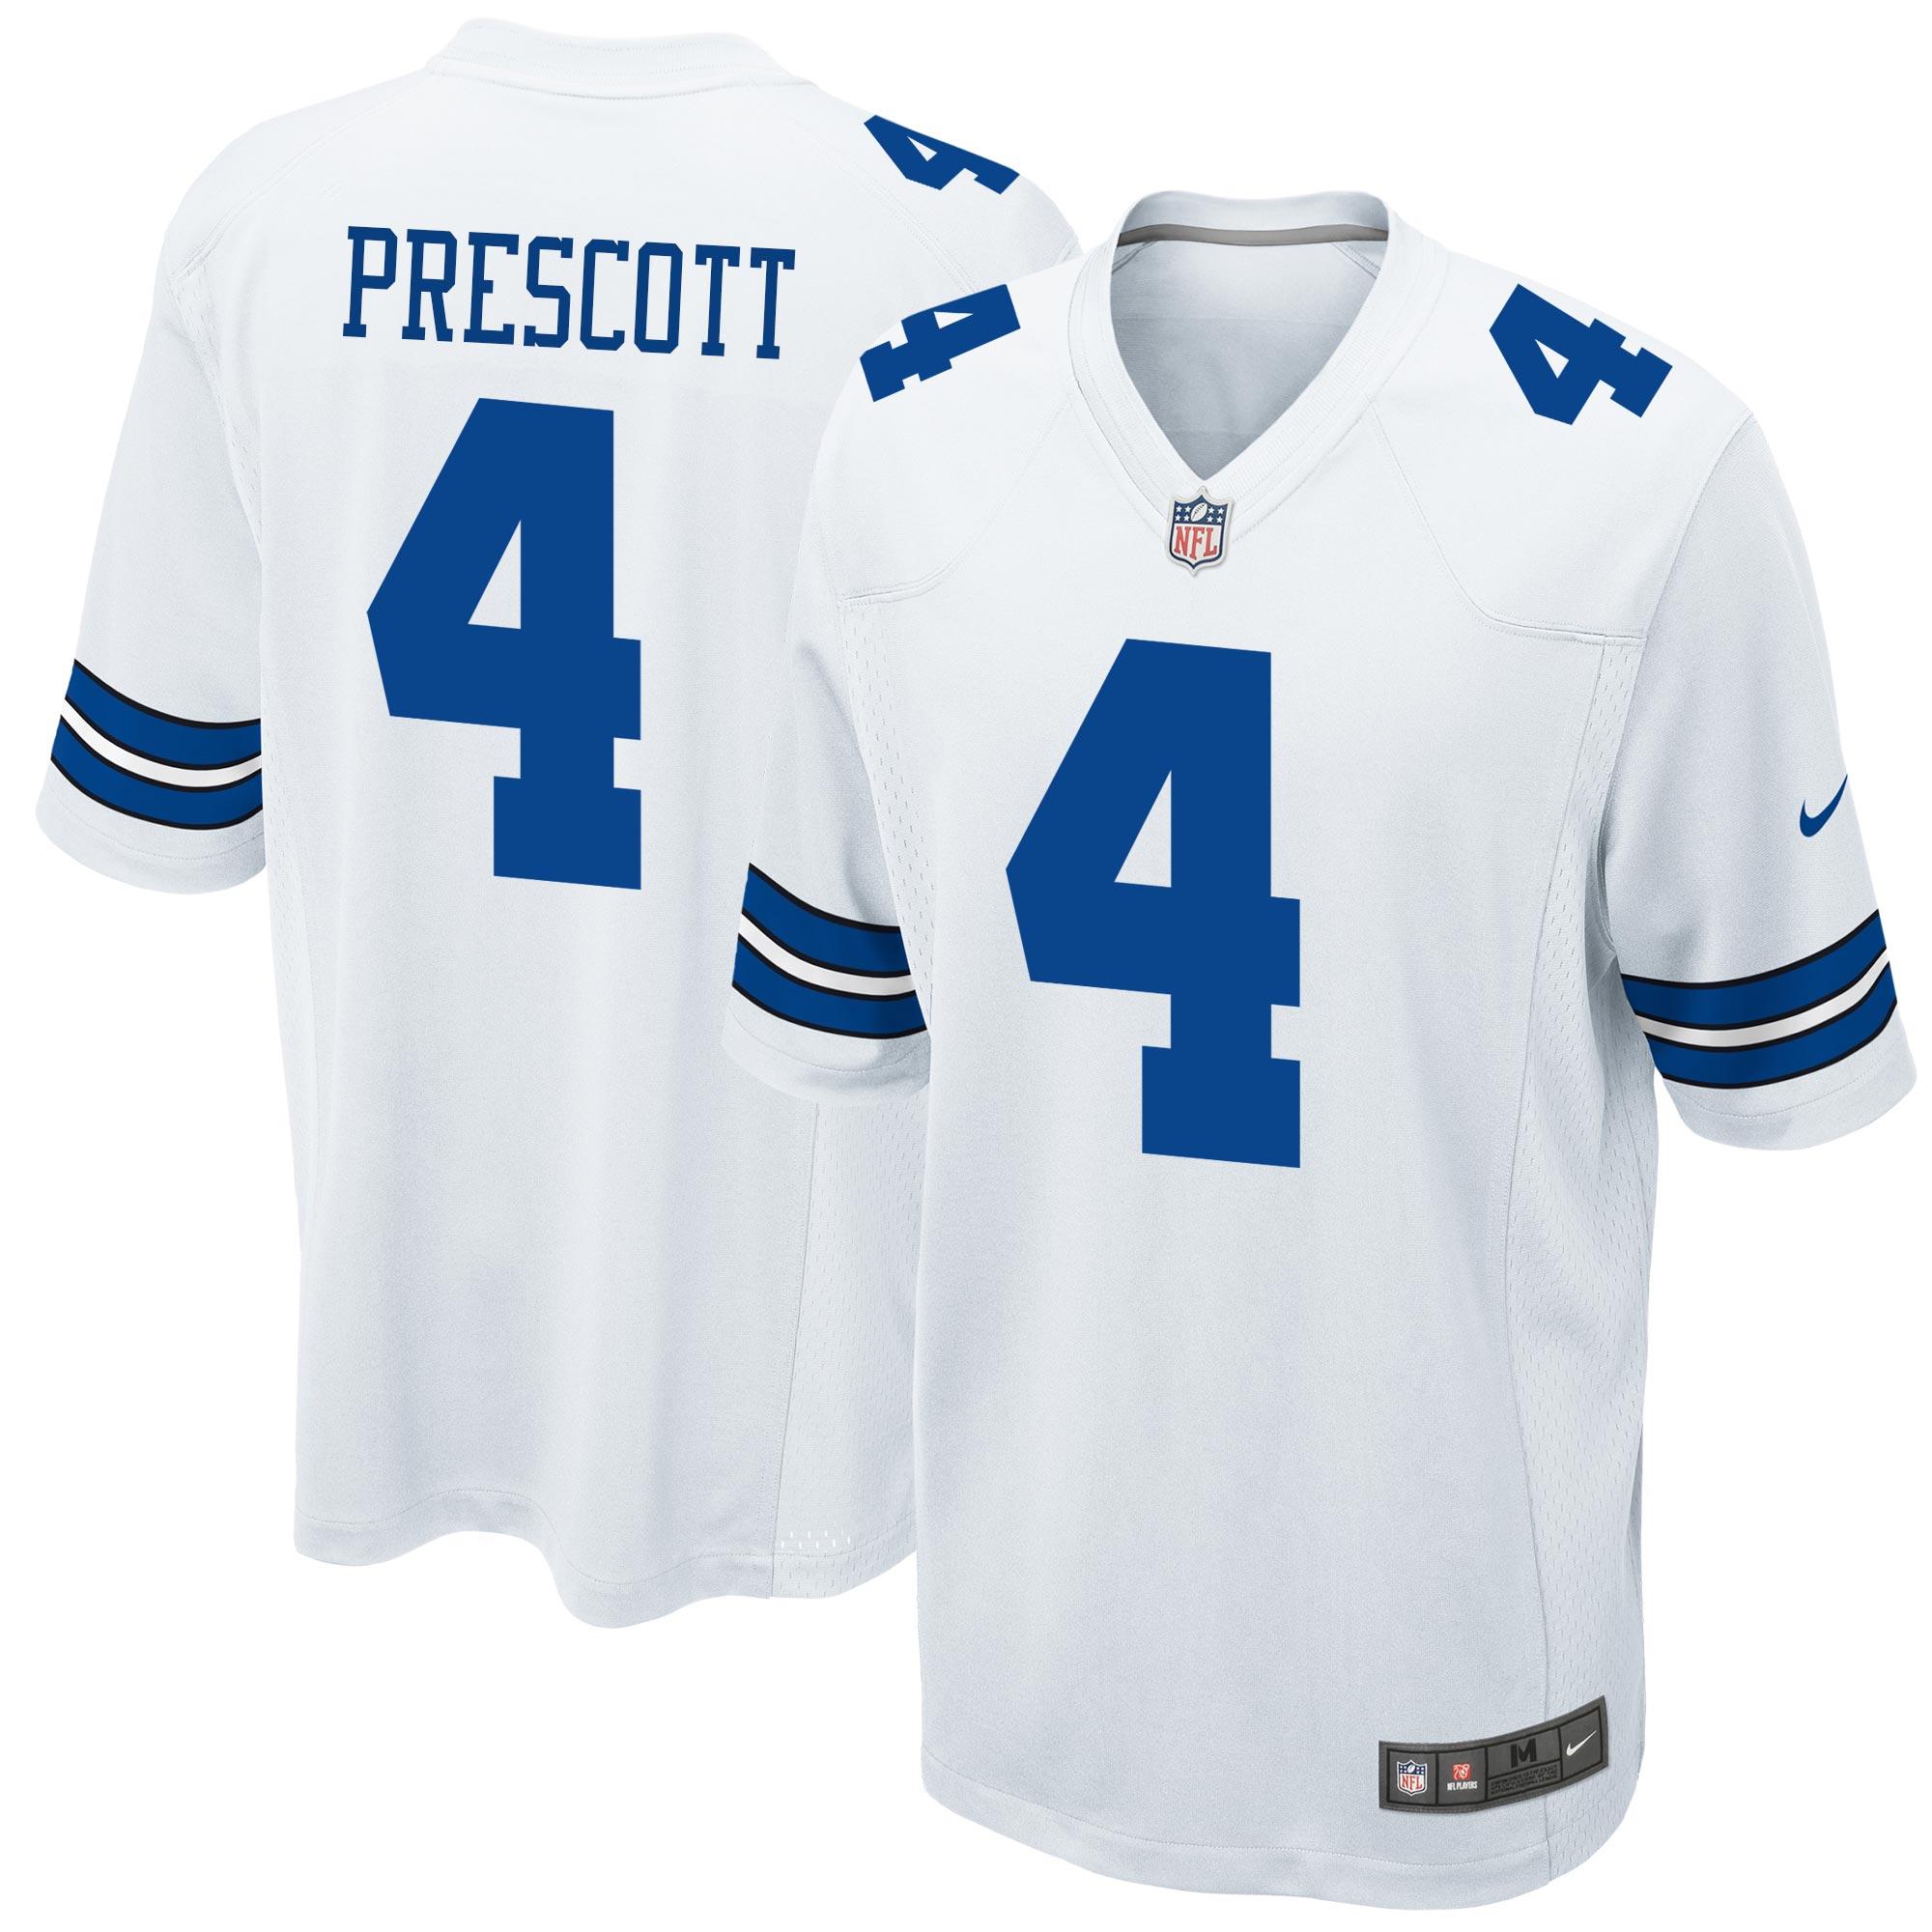 Dallas Cowboys Auswärtstrikot – Dak Prescott